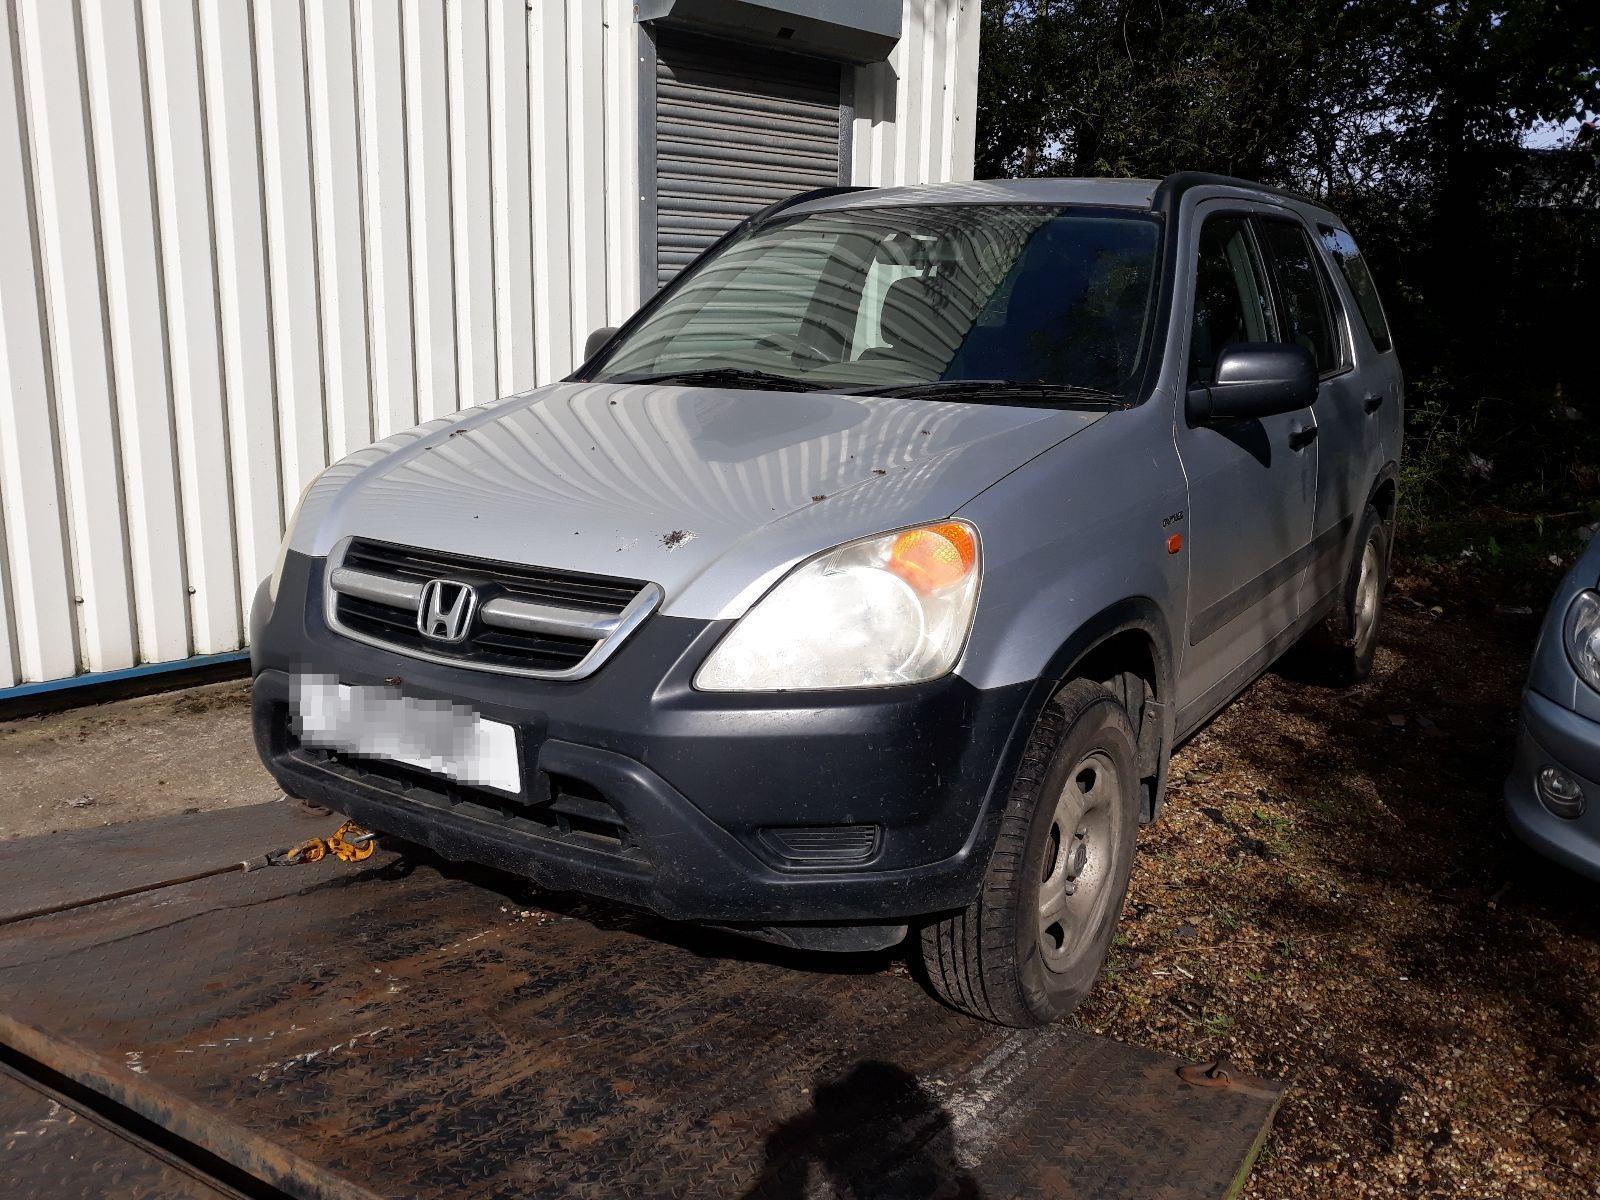 Honda Cr V 2002 To 2003 Se 5 Door Estate Scrap Salvage Car For